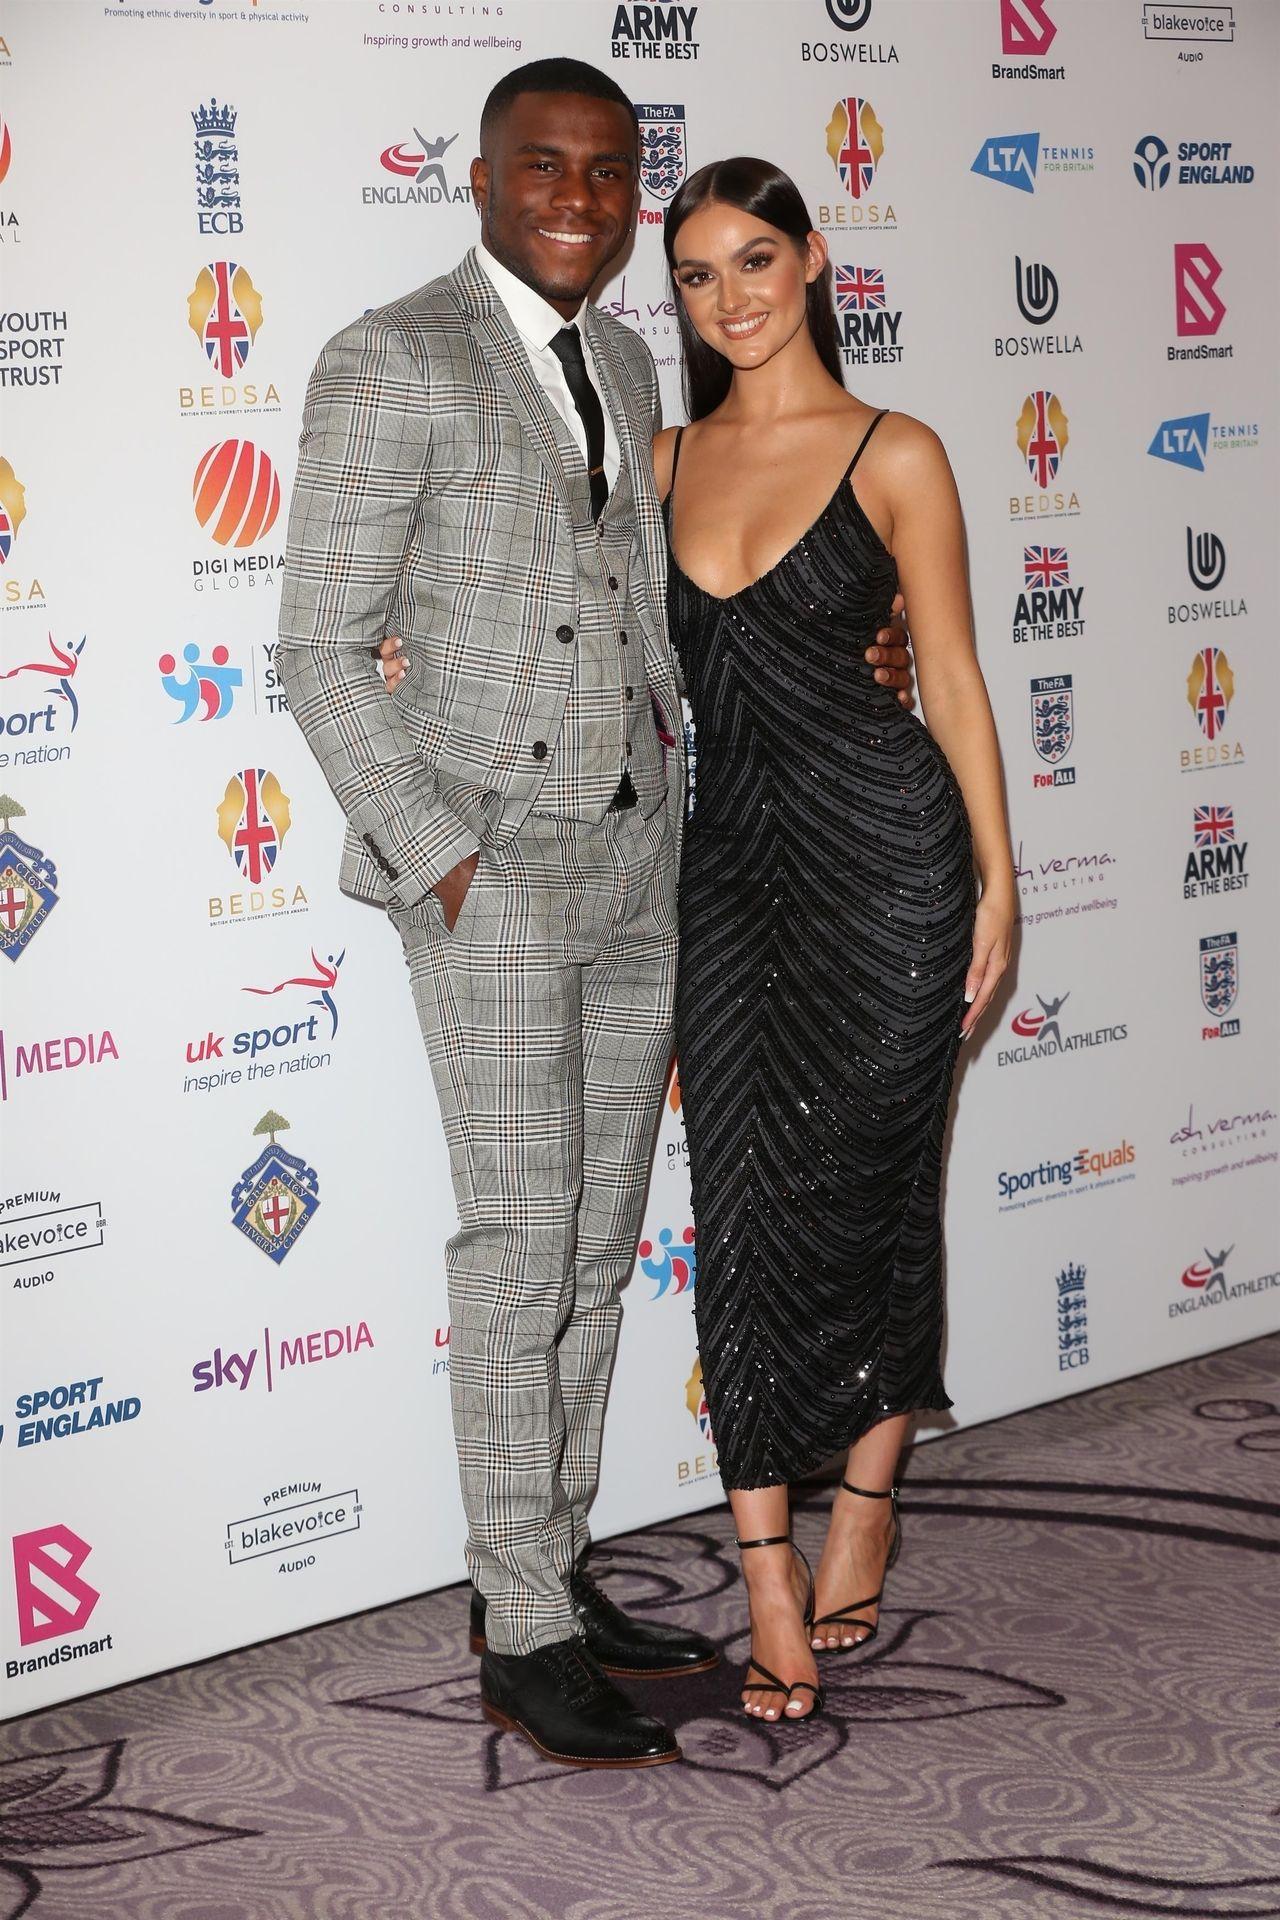 Siannise Fudge & Luke Trotman Are Seen At British Ethnic Diversity Sports Awards 0030